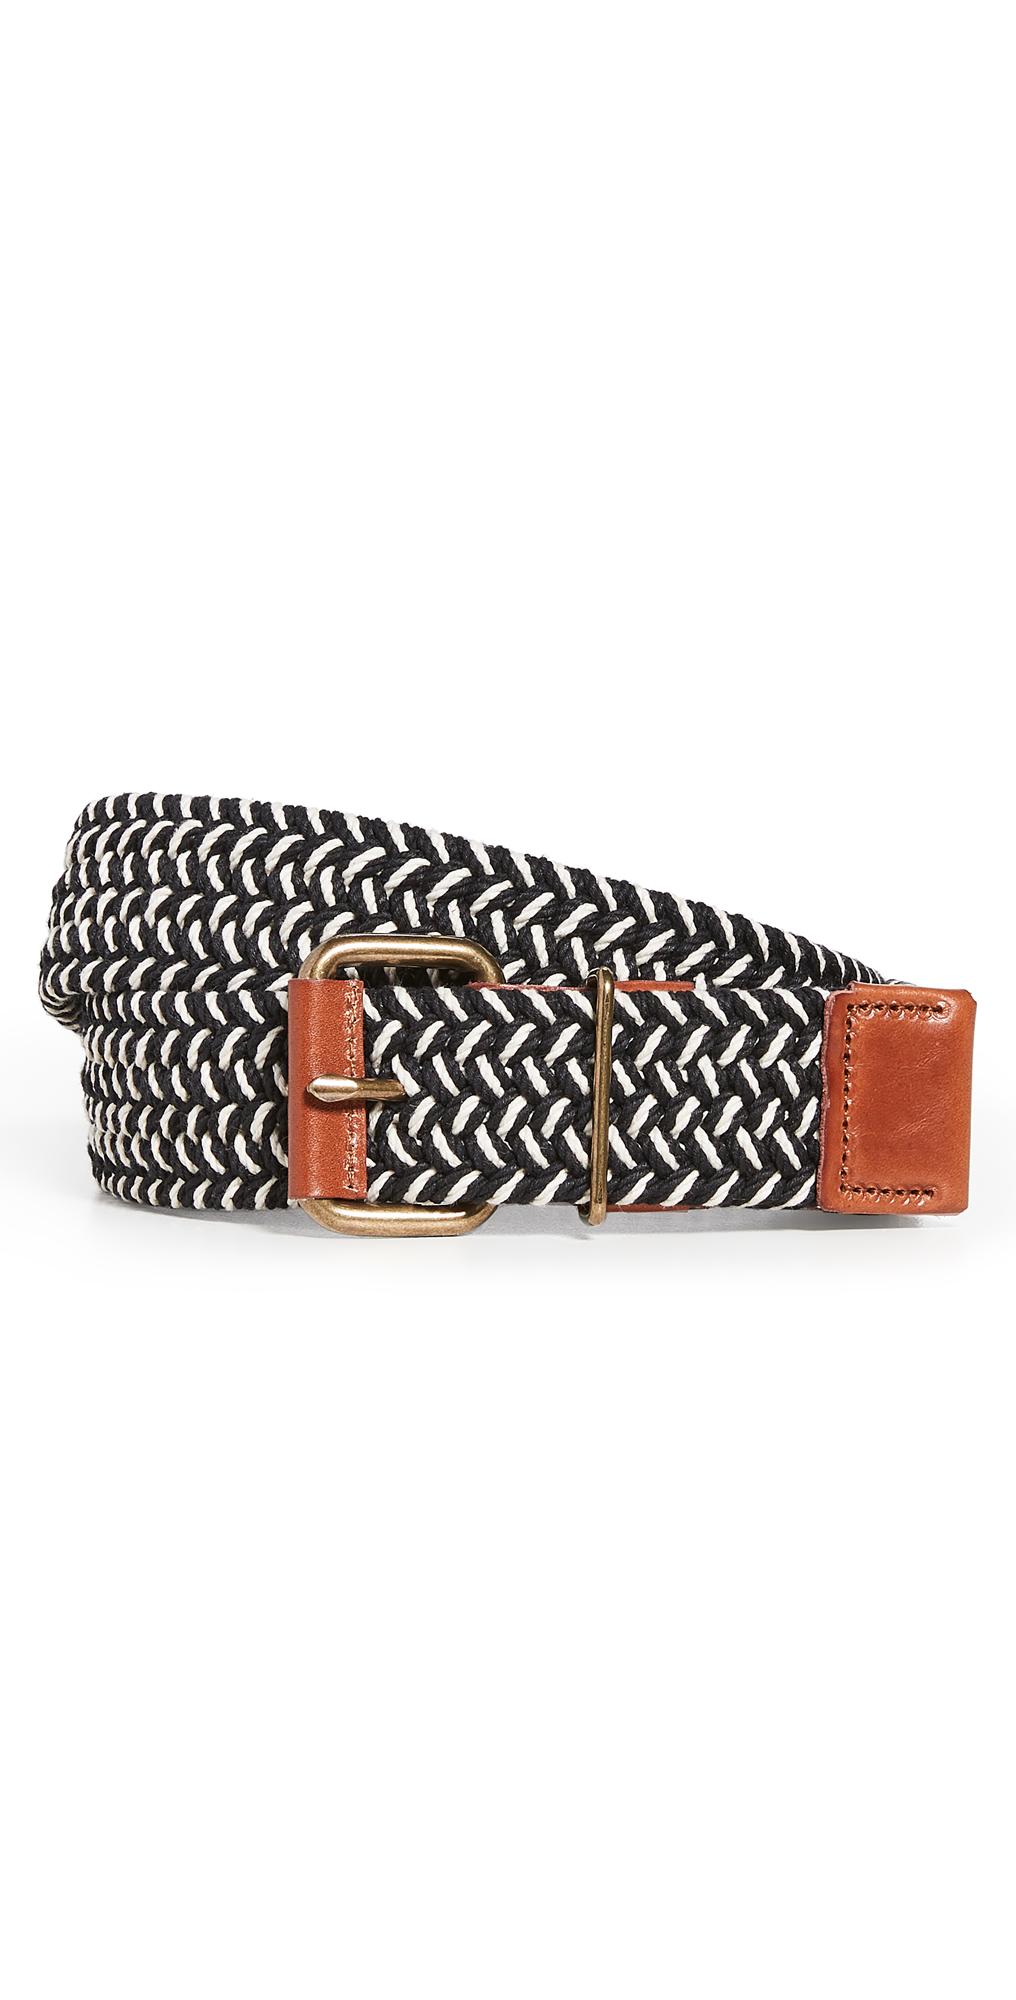 Madewell 3 Braid Woven Belt